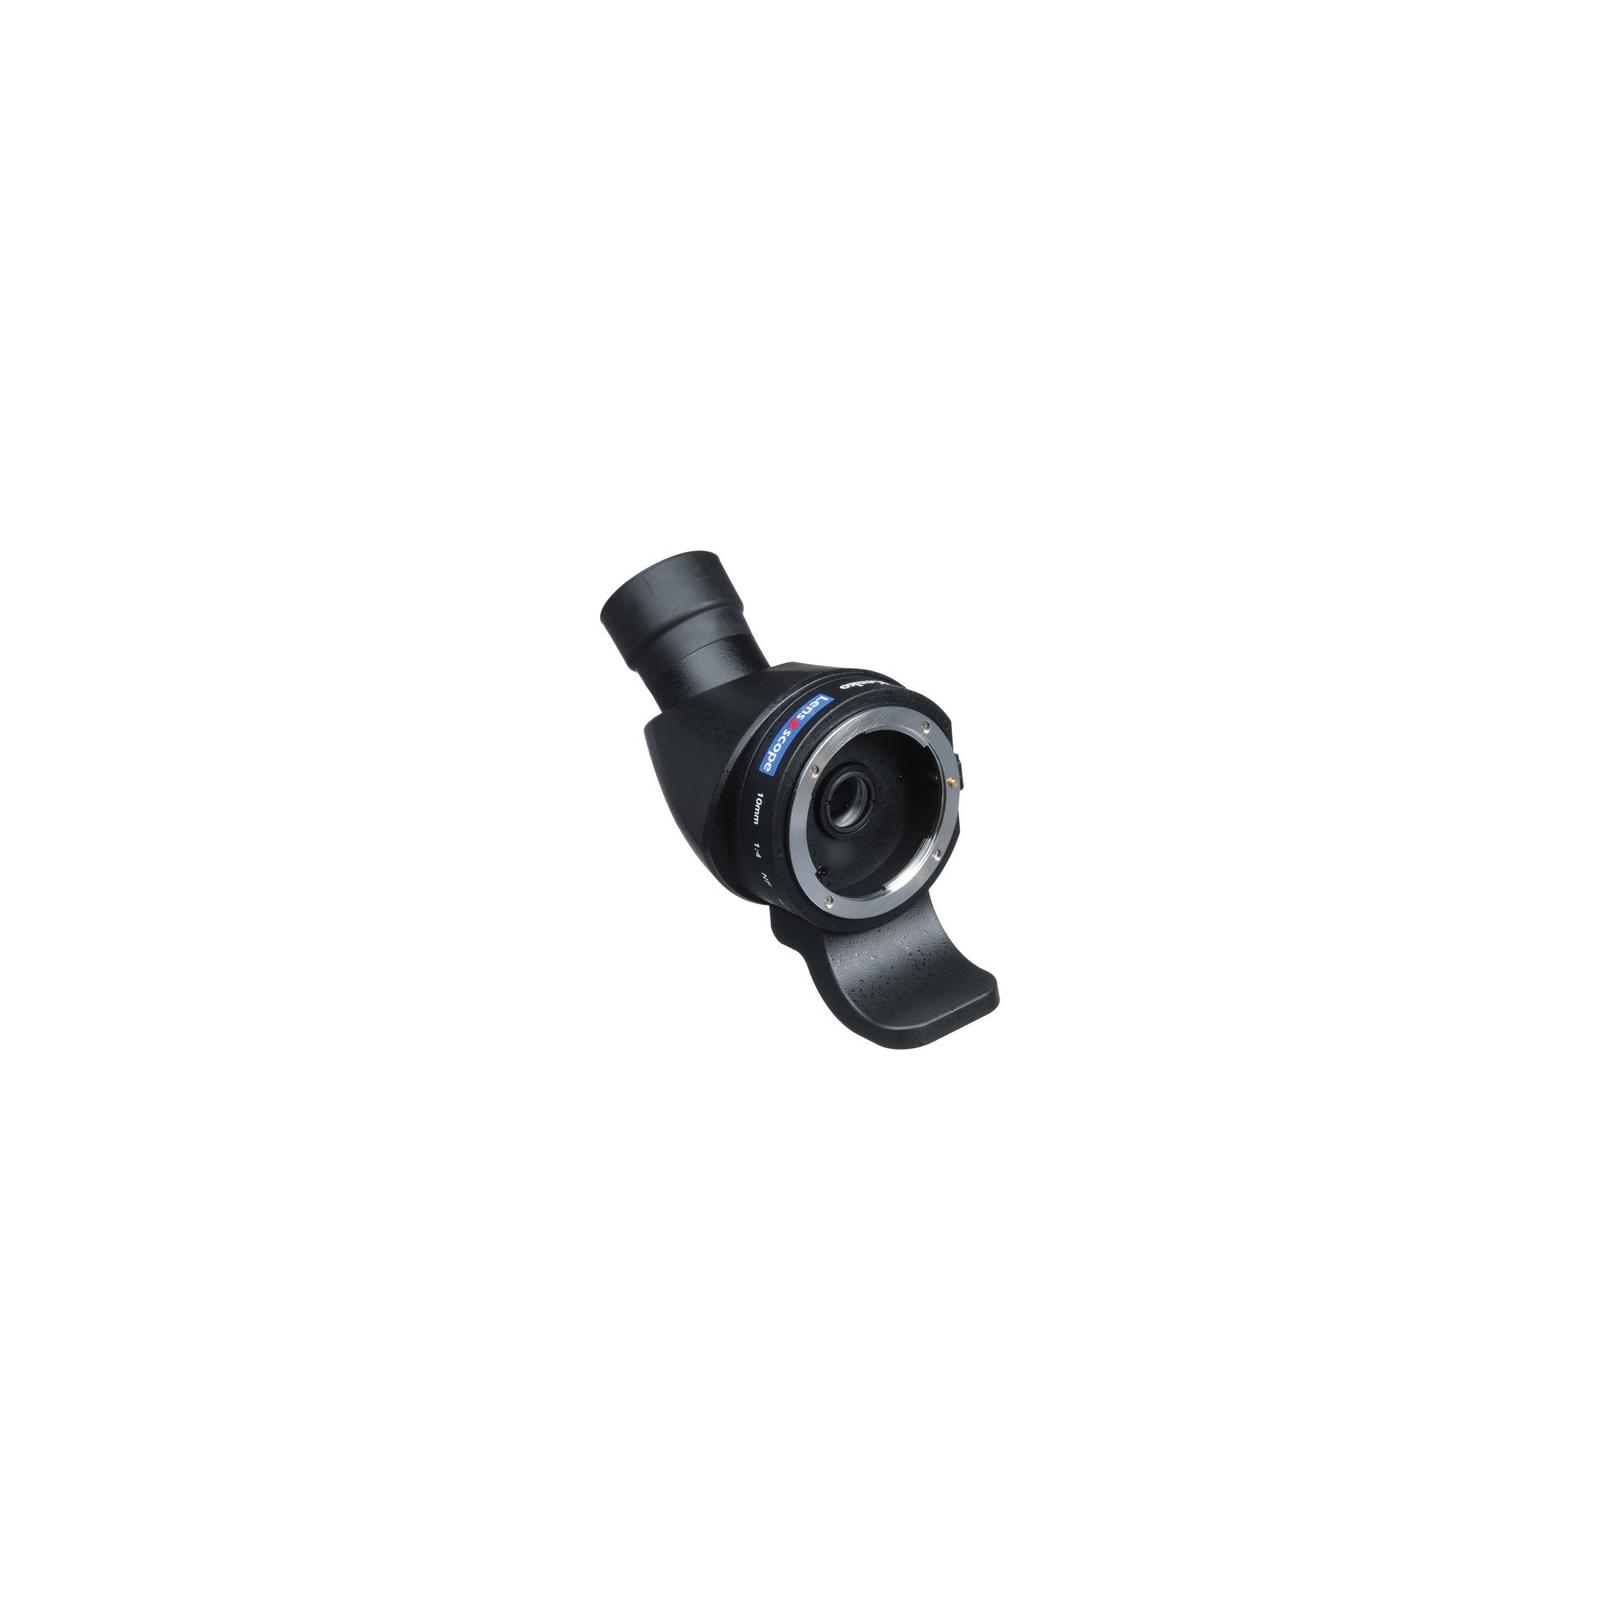 Фото-адаптер Kenko Lens2Scope for Nikon F Angle Black (090129) изображение 2